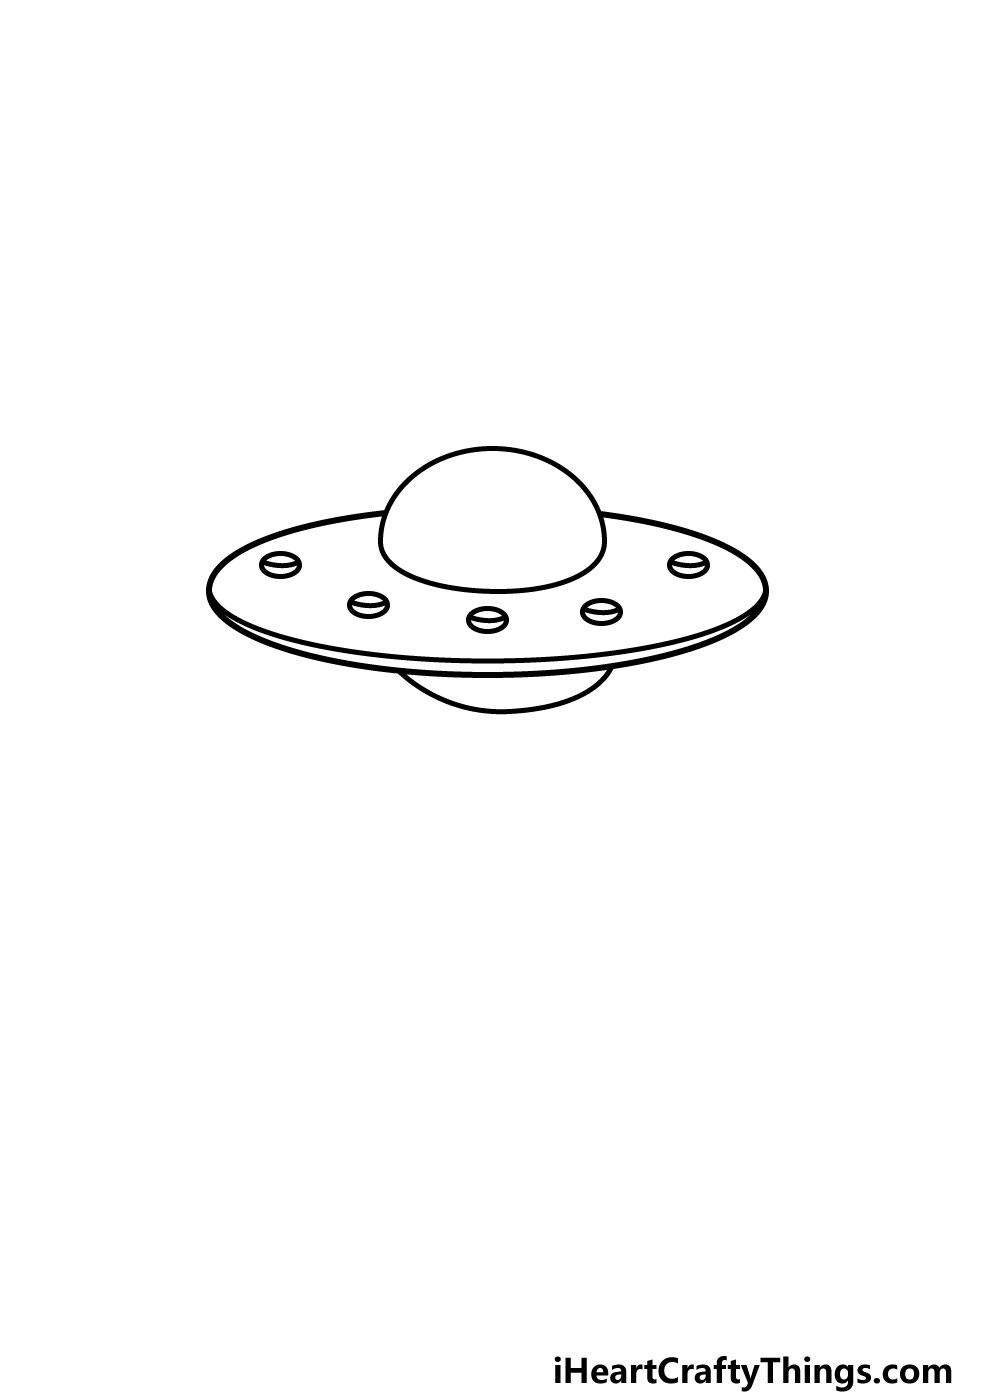 drawing a UFO step 4